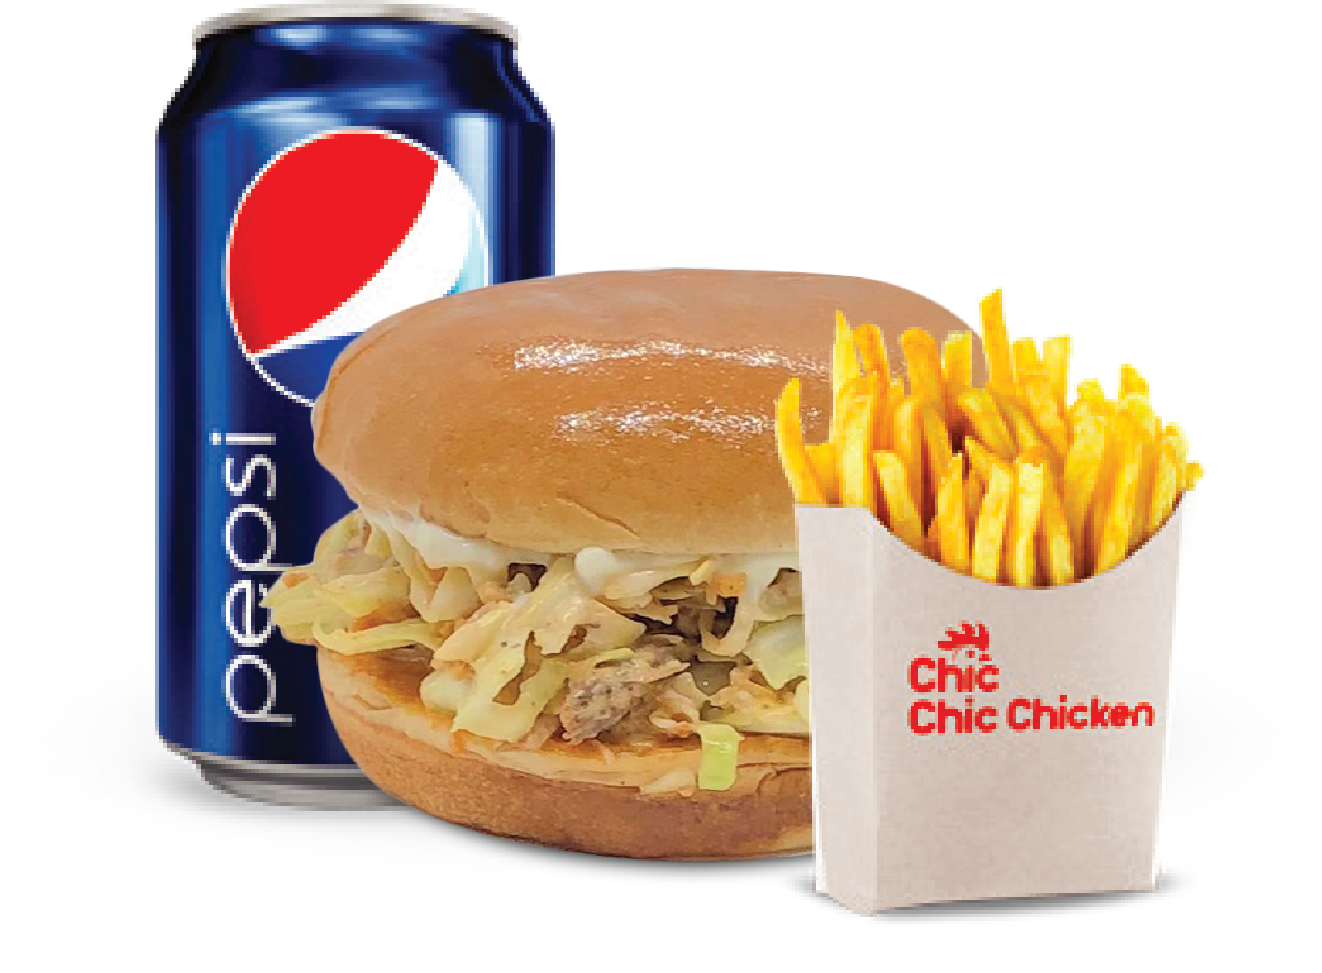 https://chicchicchicken.com/wp-content/uploads/2021/05/Burger-Combo-Creamy-Chicken.png